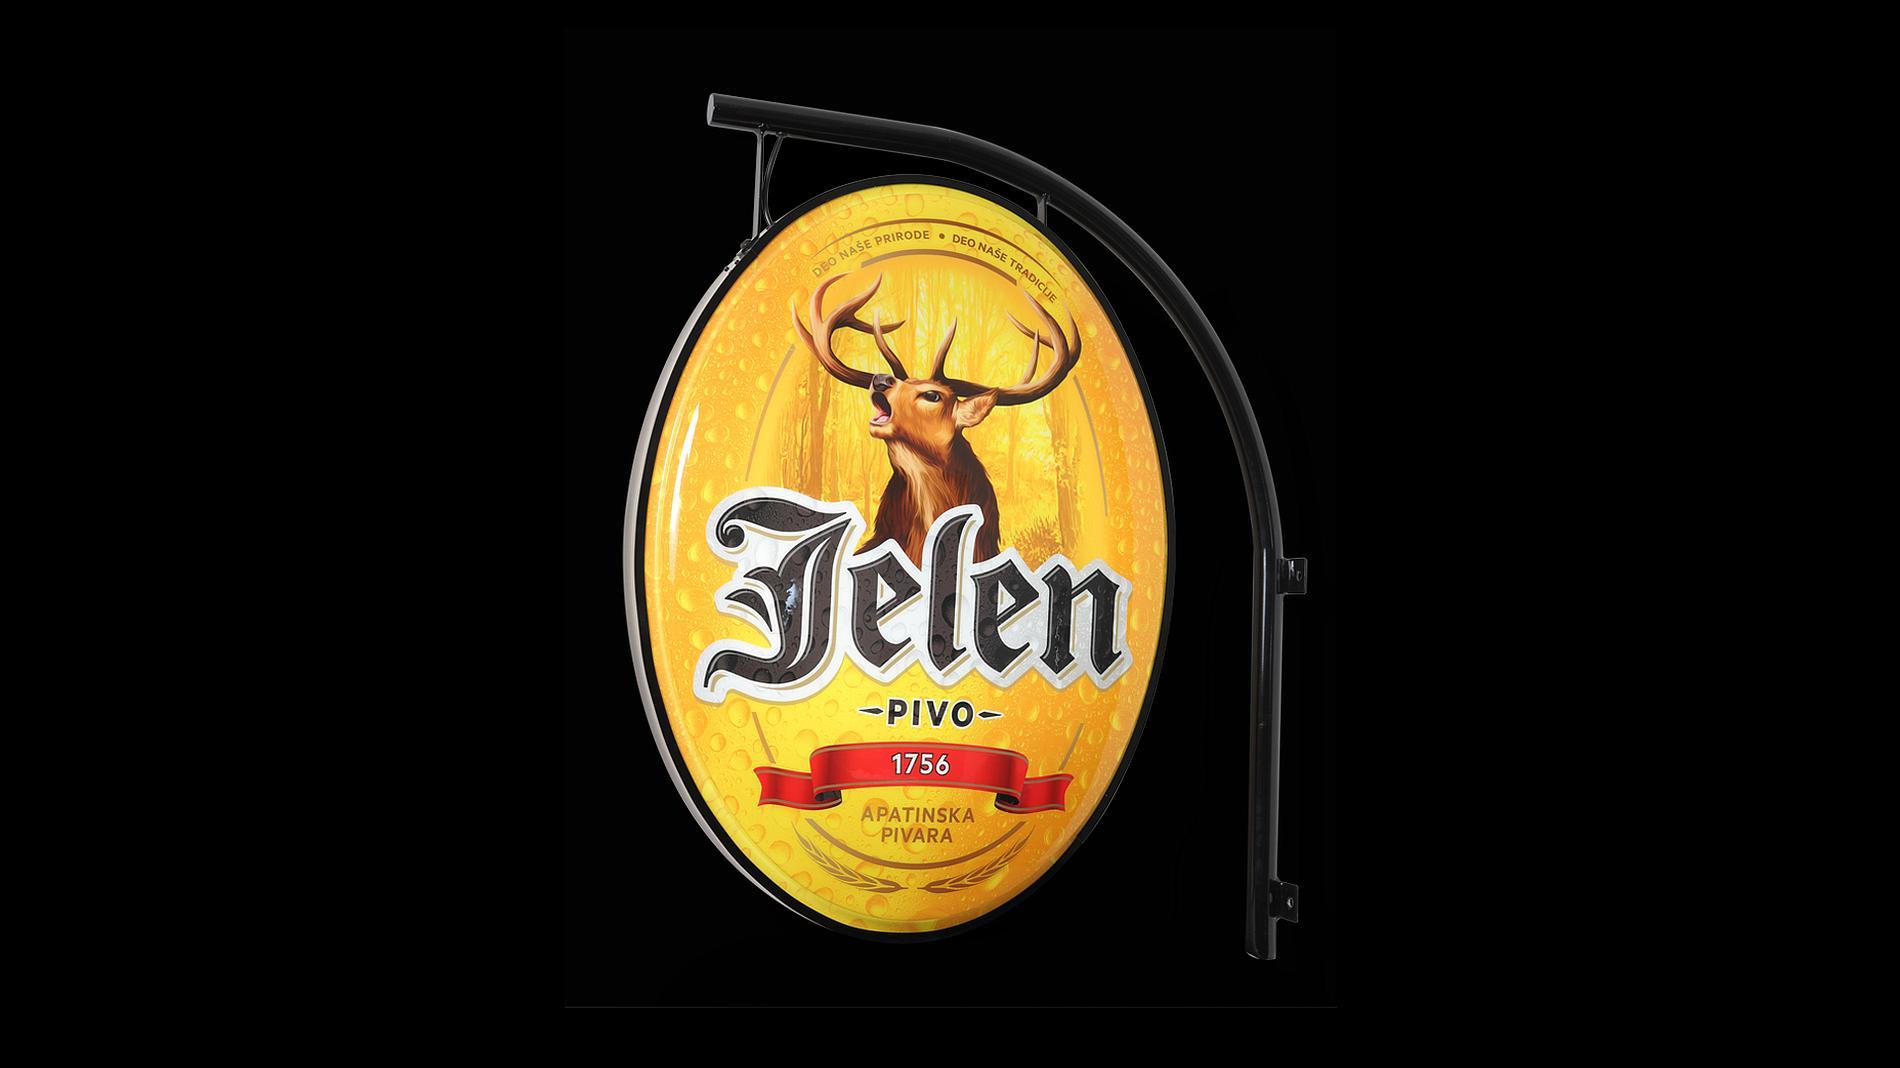 exterior lightbox Jelen, POS materials